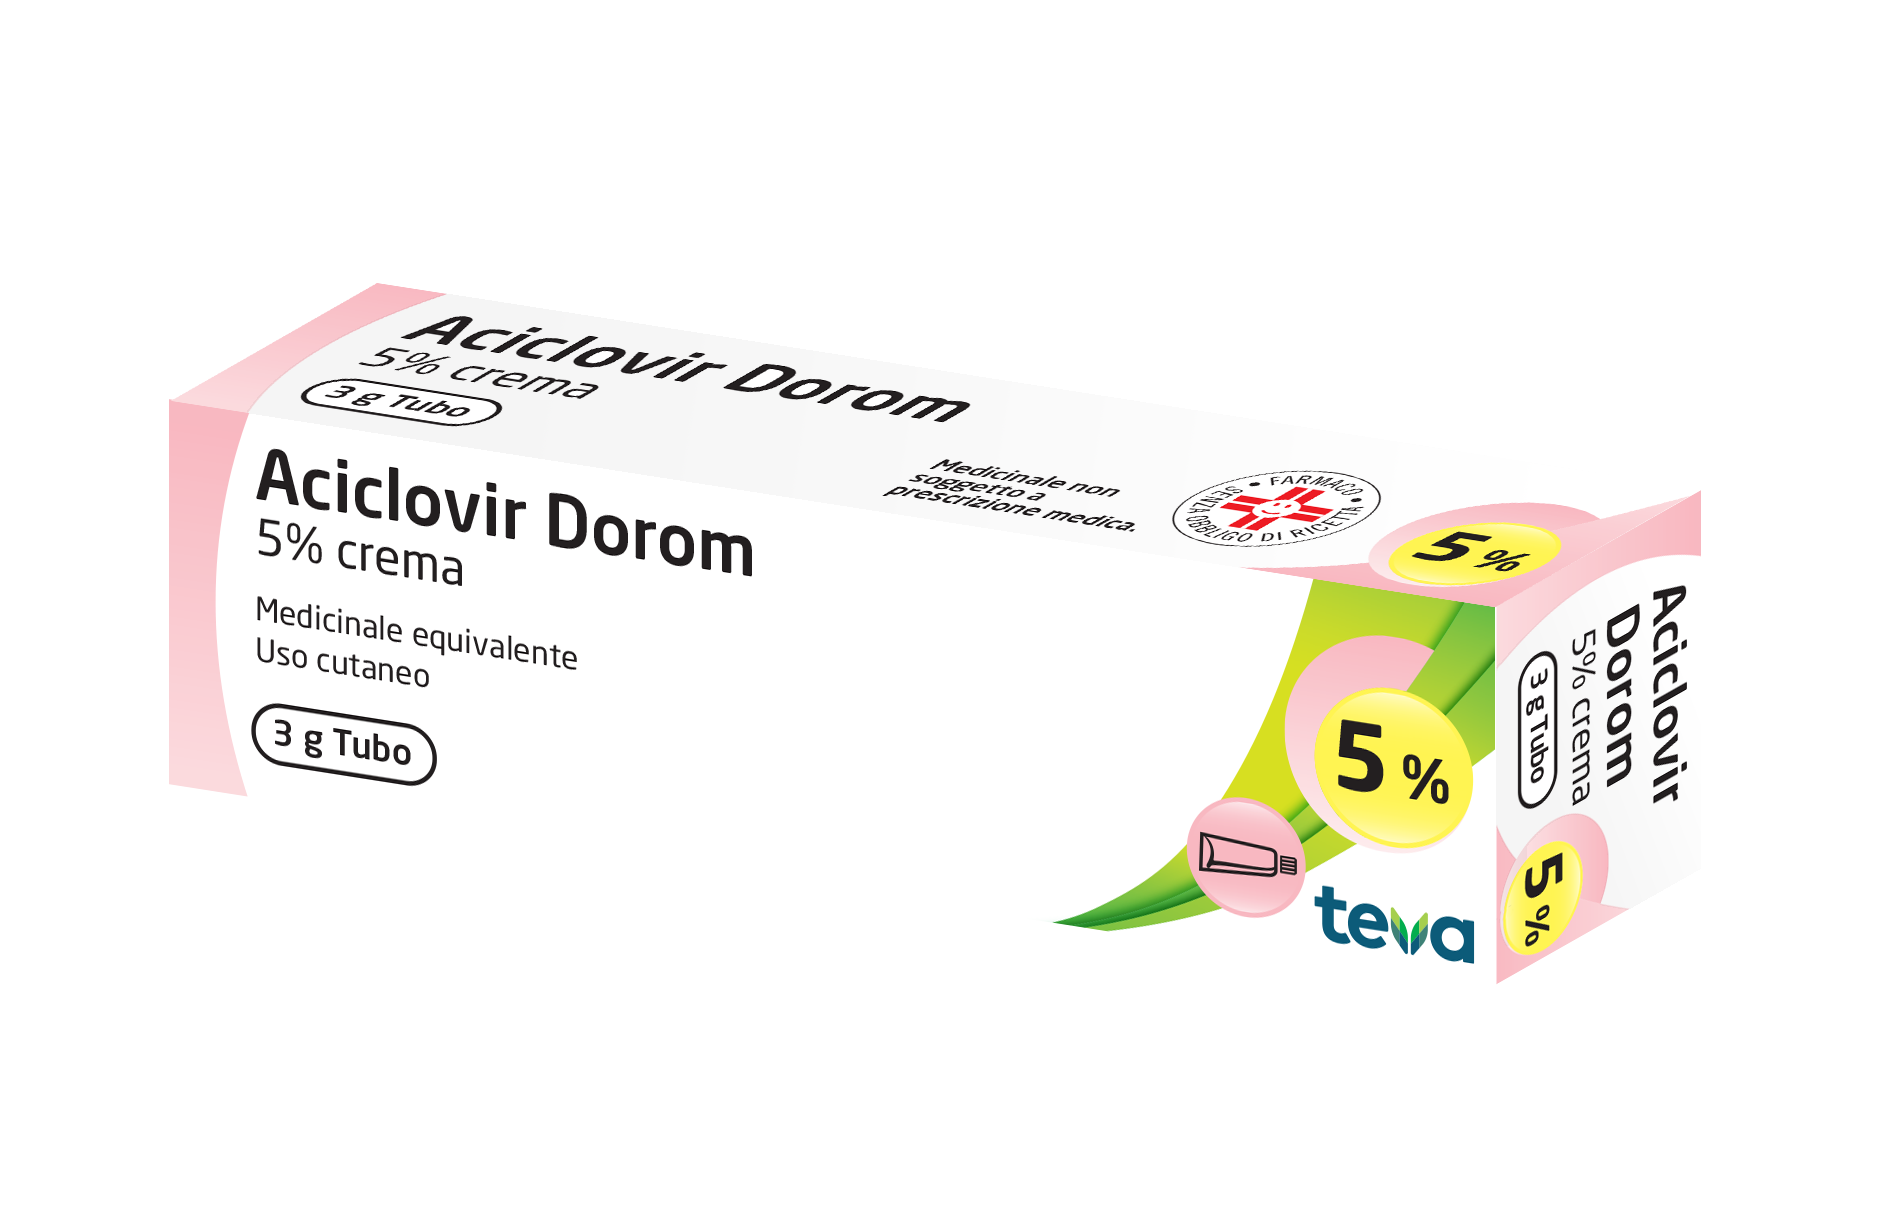 ACICLOVIR DOROM*CREMA 3G 5% - Farmaunclick.it